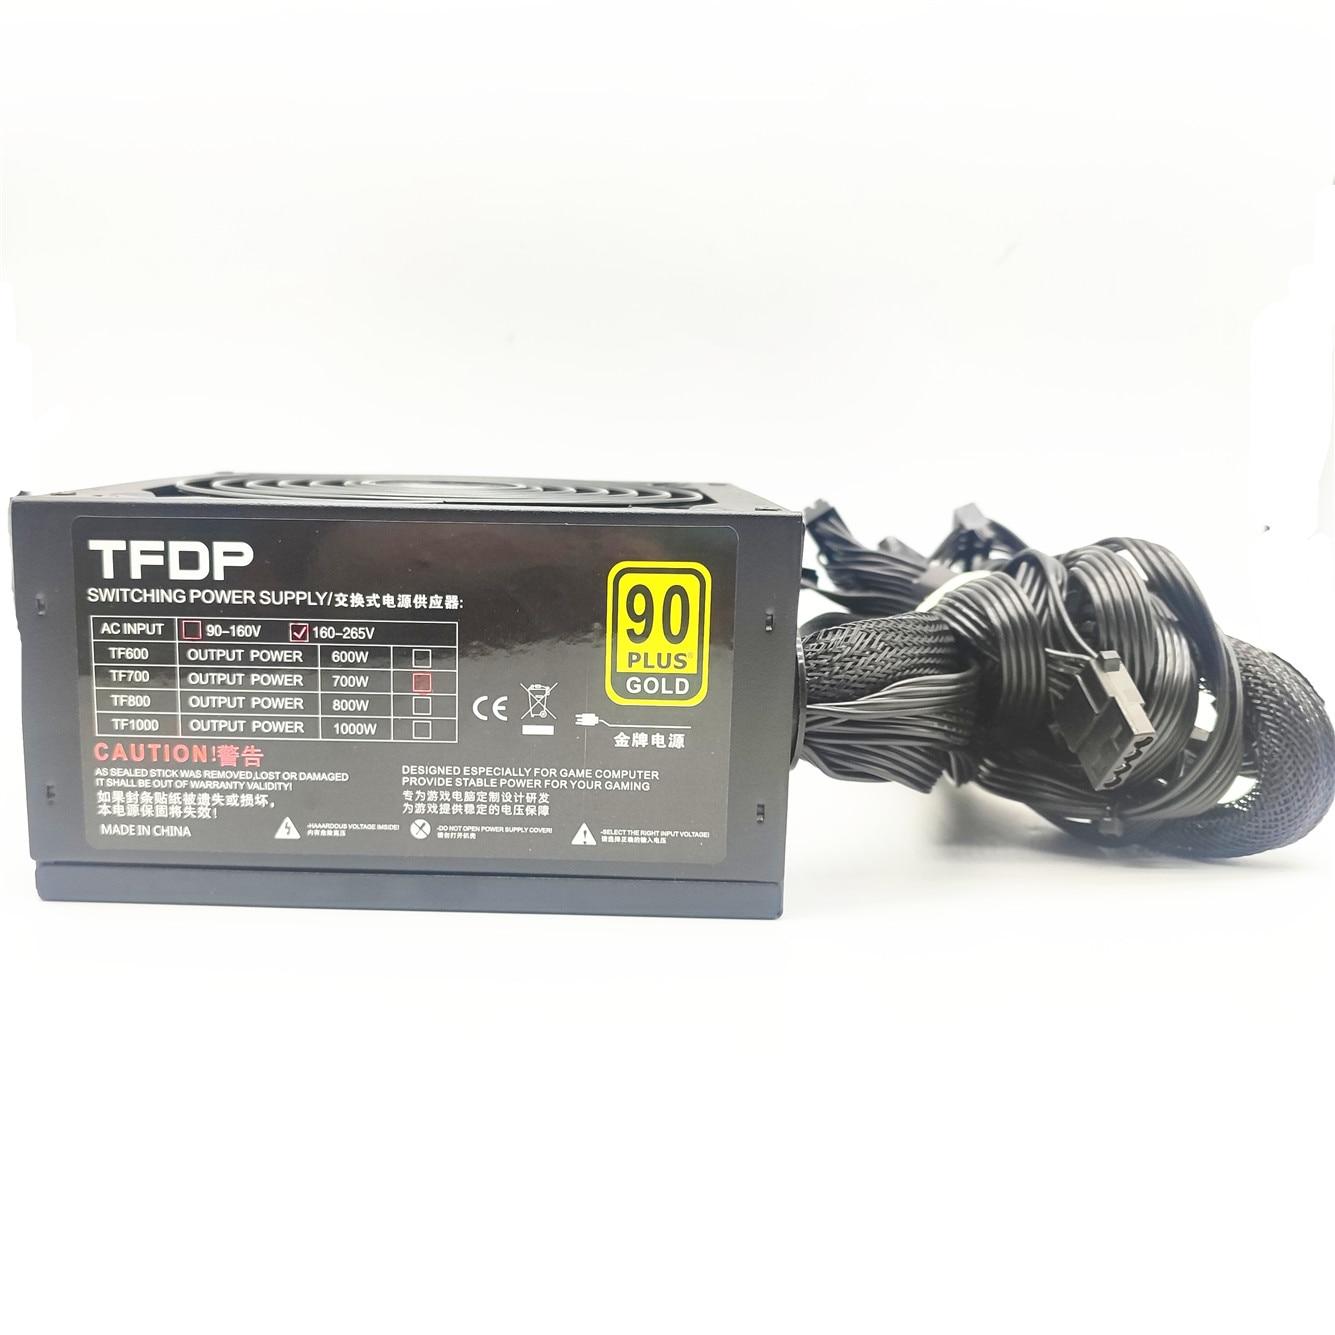 700W Power Supply for Gaming 700W ATX PC Computer Power Supply Gaming PSU 12V 24PIN Active AC Input 90-240 Modular Psu PEAK LED